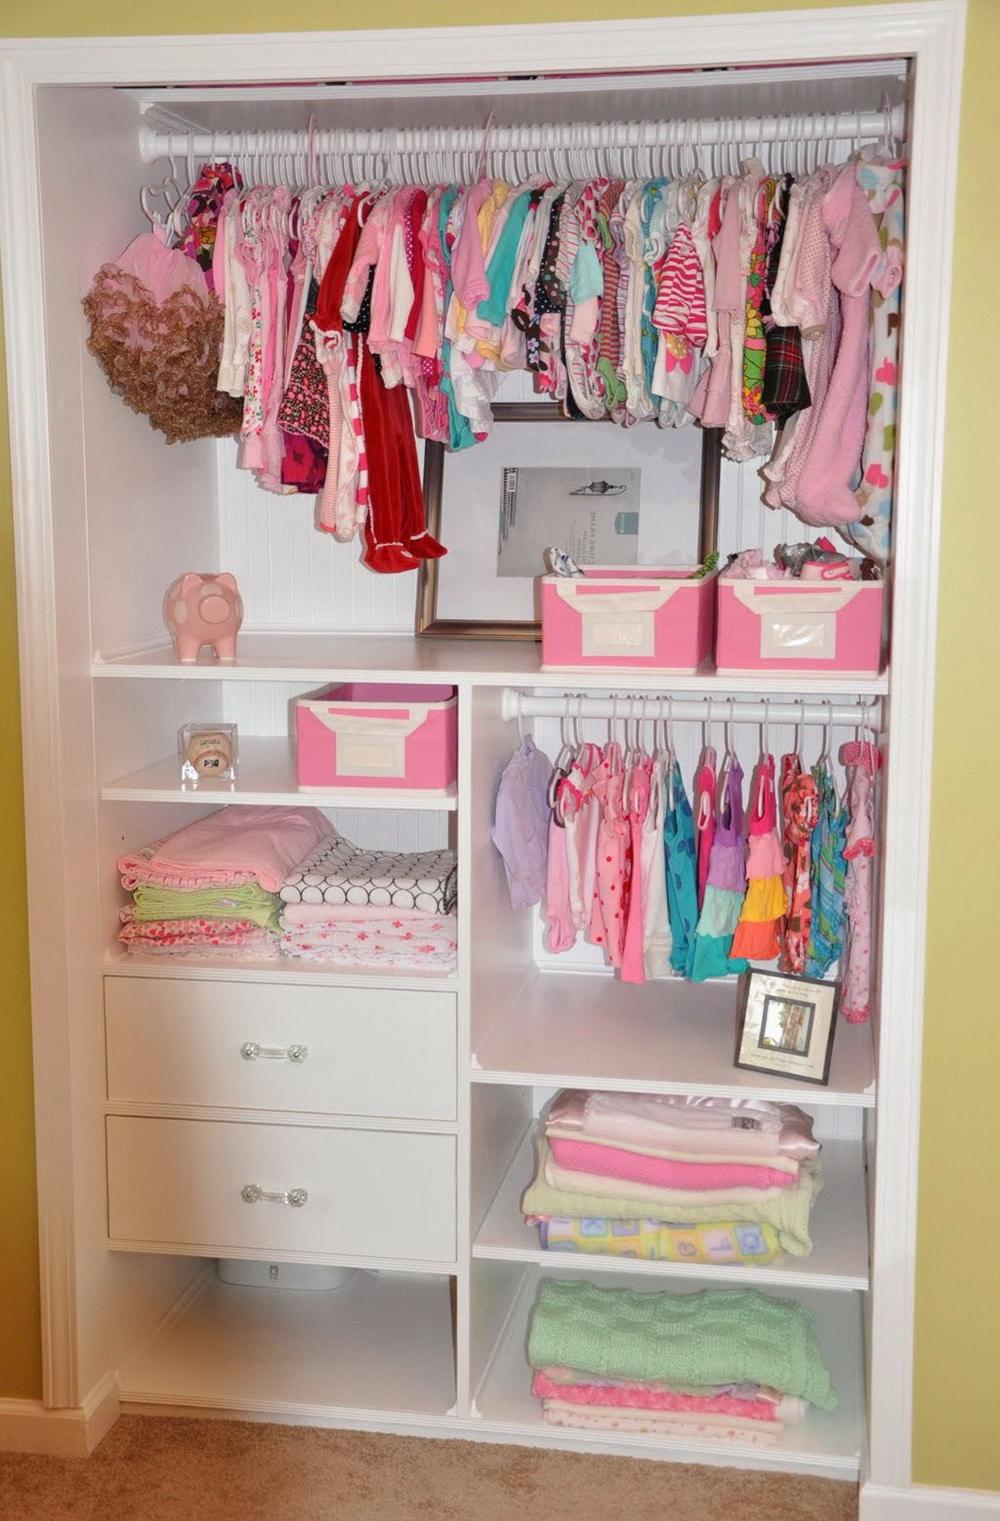 Closet Storage Ideas For Kidscloset Storage Ideas For Kidscloset Storage Ideas For Kids